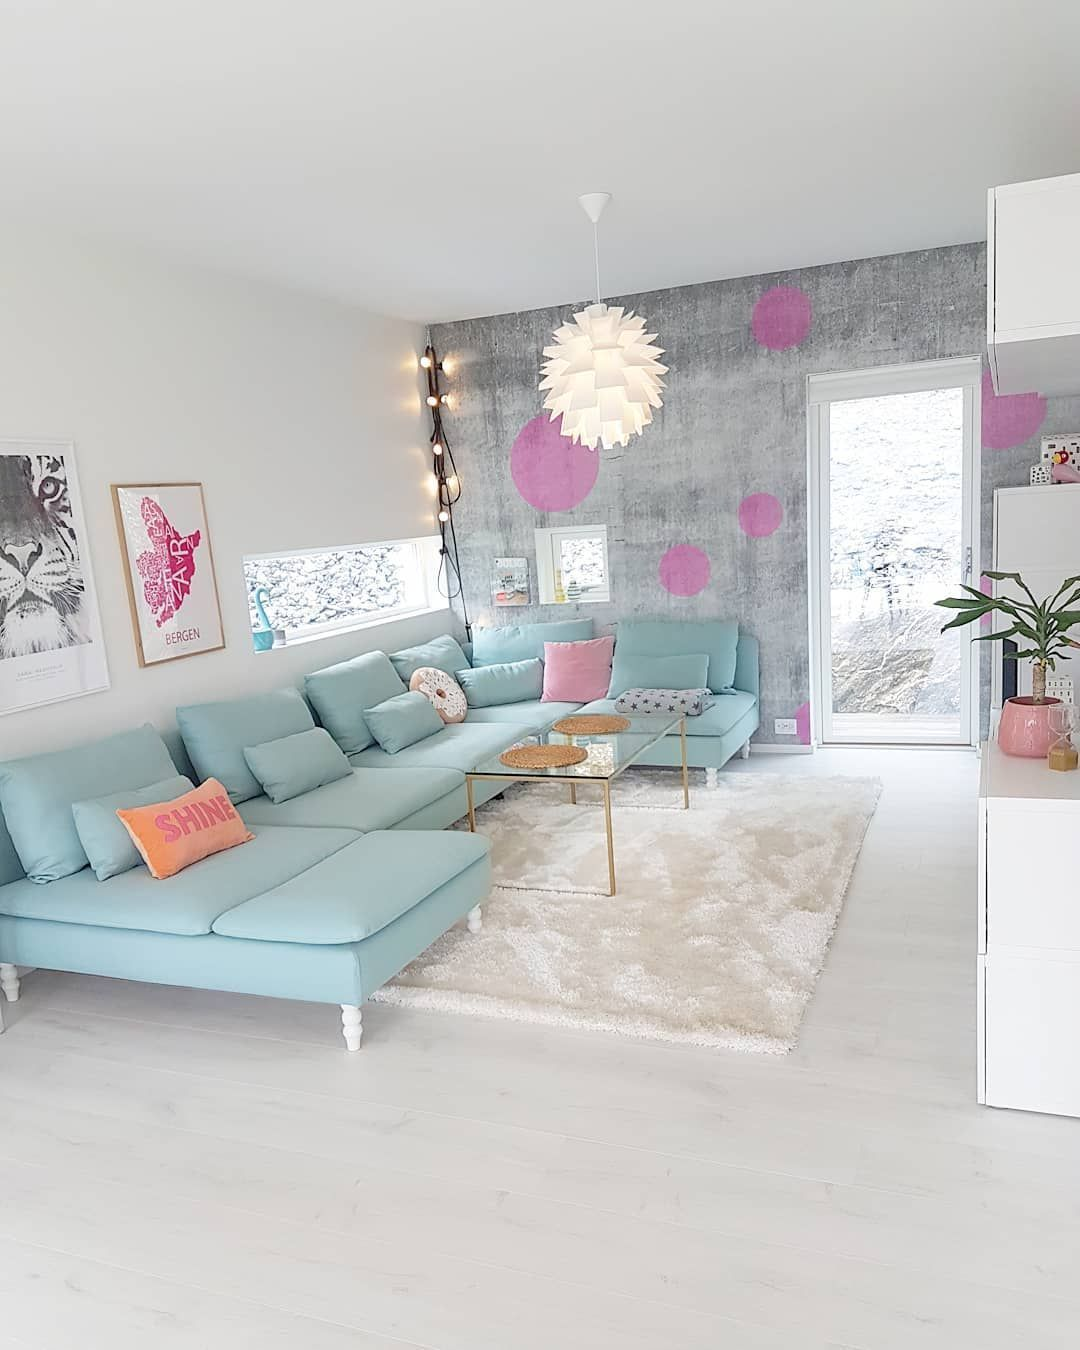 Decor Ideas With Grey Sofa Decor Ideas Grey Walls Decor